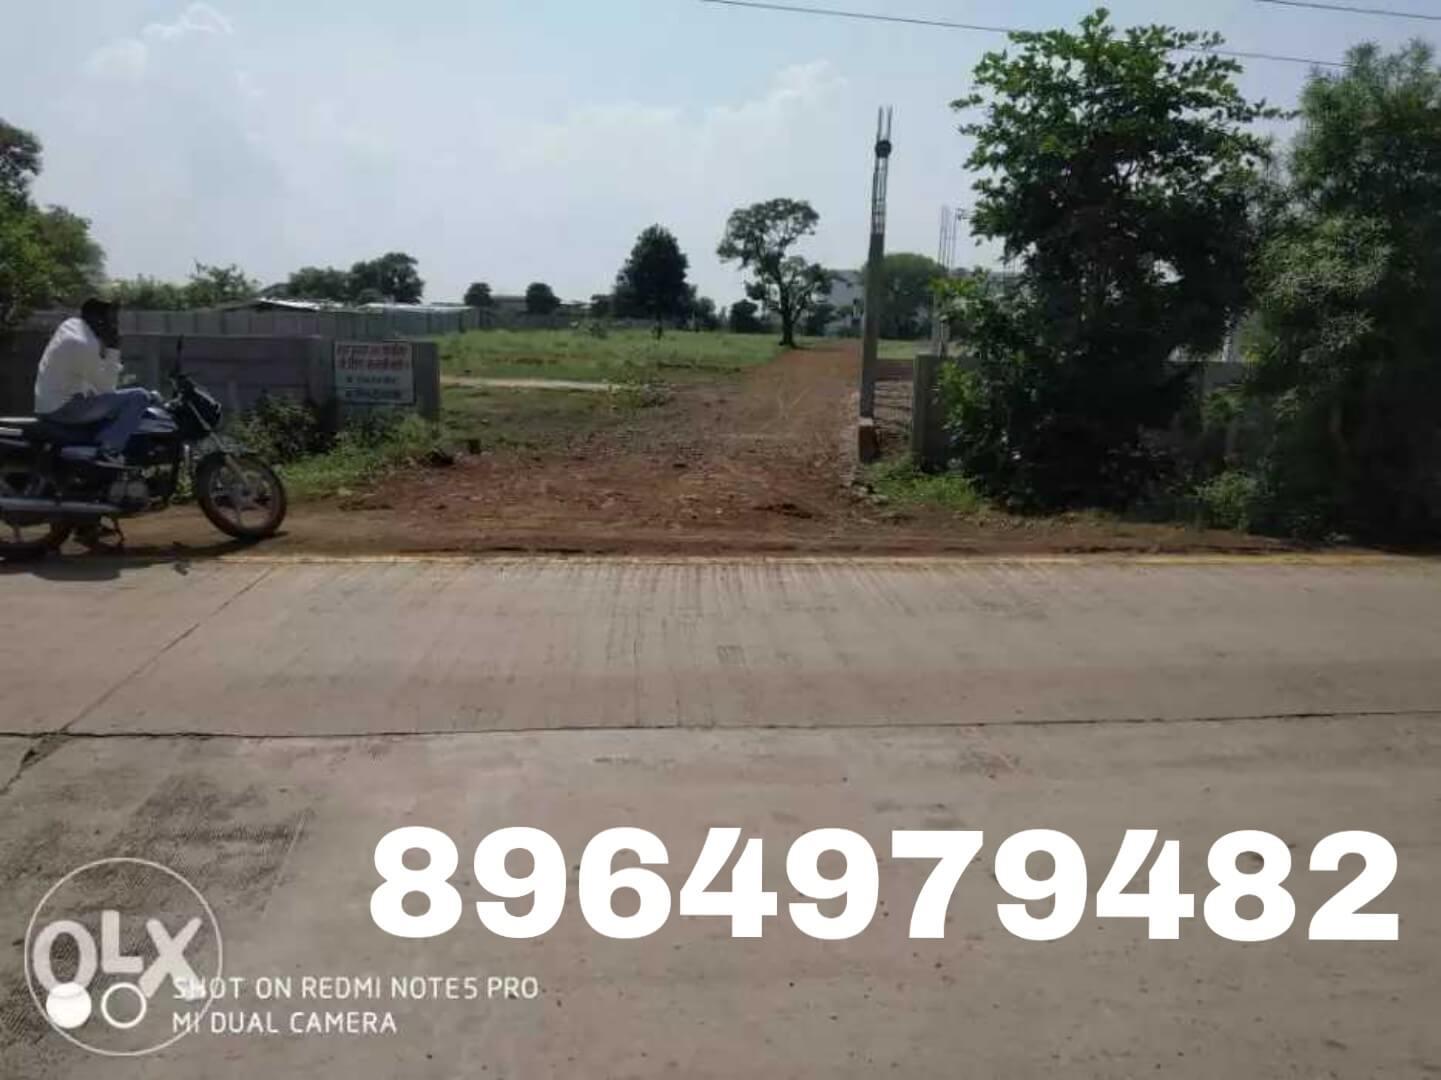 Shaidhaam & Jankidhaam city full deployment wonderful location cabord campus men rod arcc neelbad bhopal